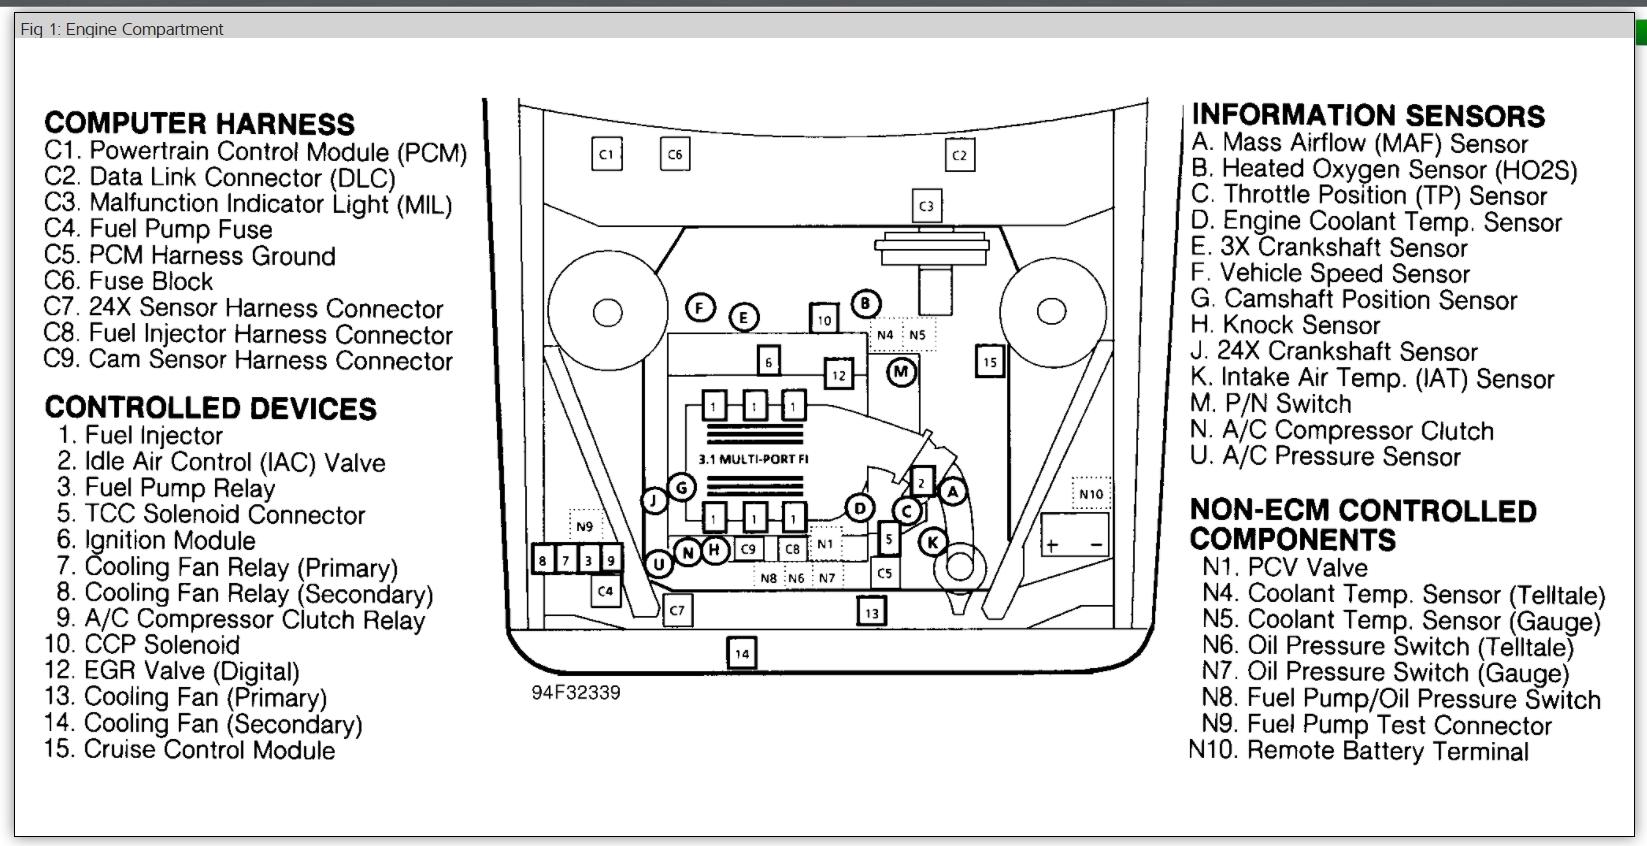 1995 Buick 3 1 Engine Diagram 1997 Saturn Engine Diagram Rccar Wiring 2010menanti Jeanjaures37 Fr